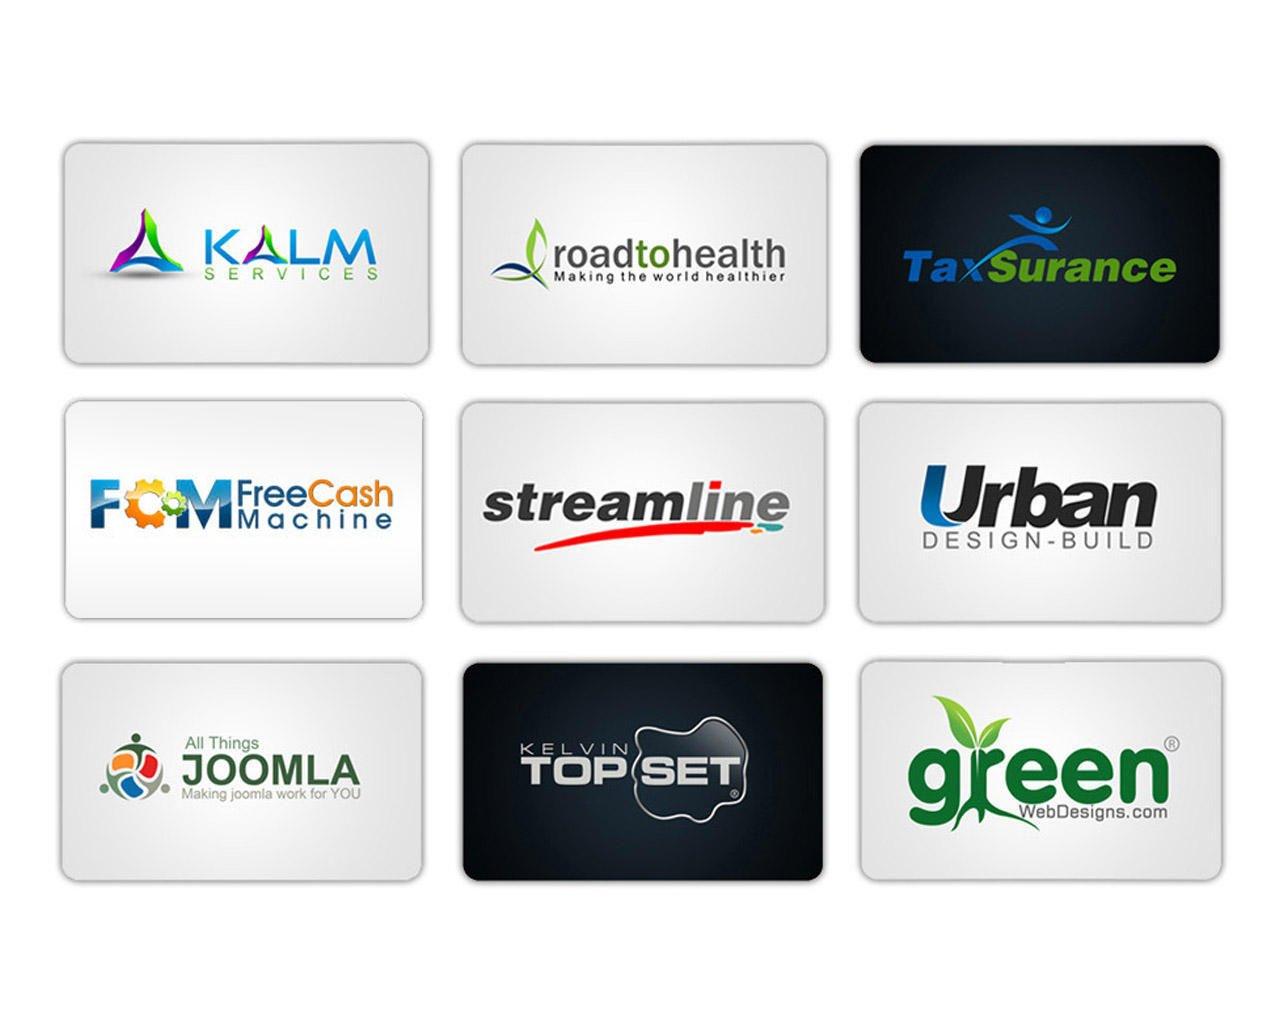 logo design branding services on envato studio professional logo design service